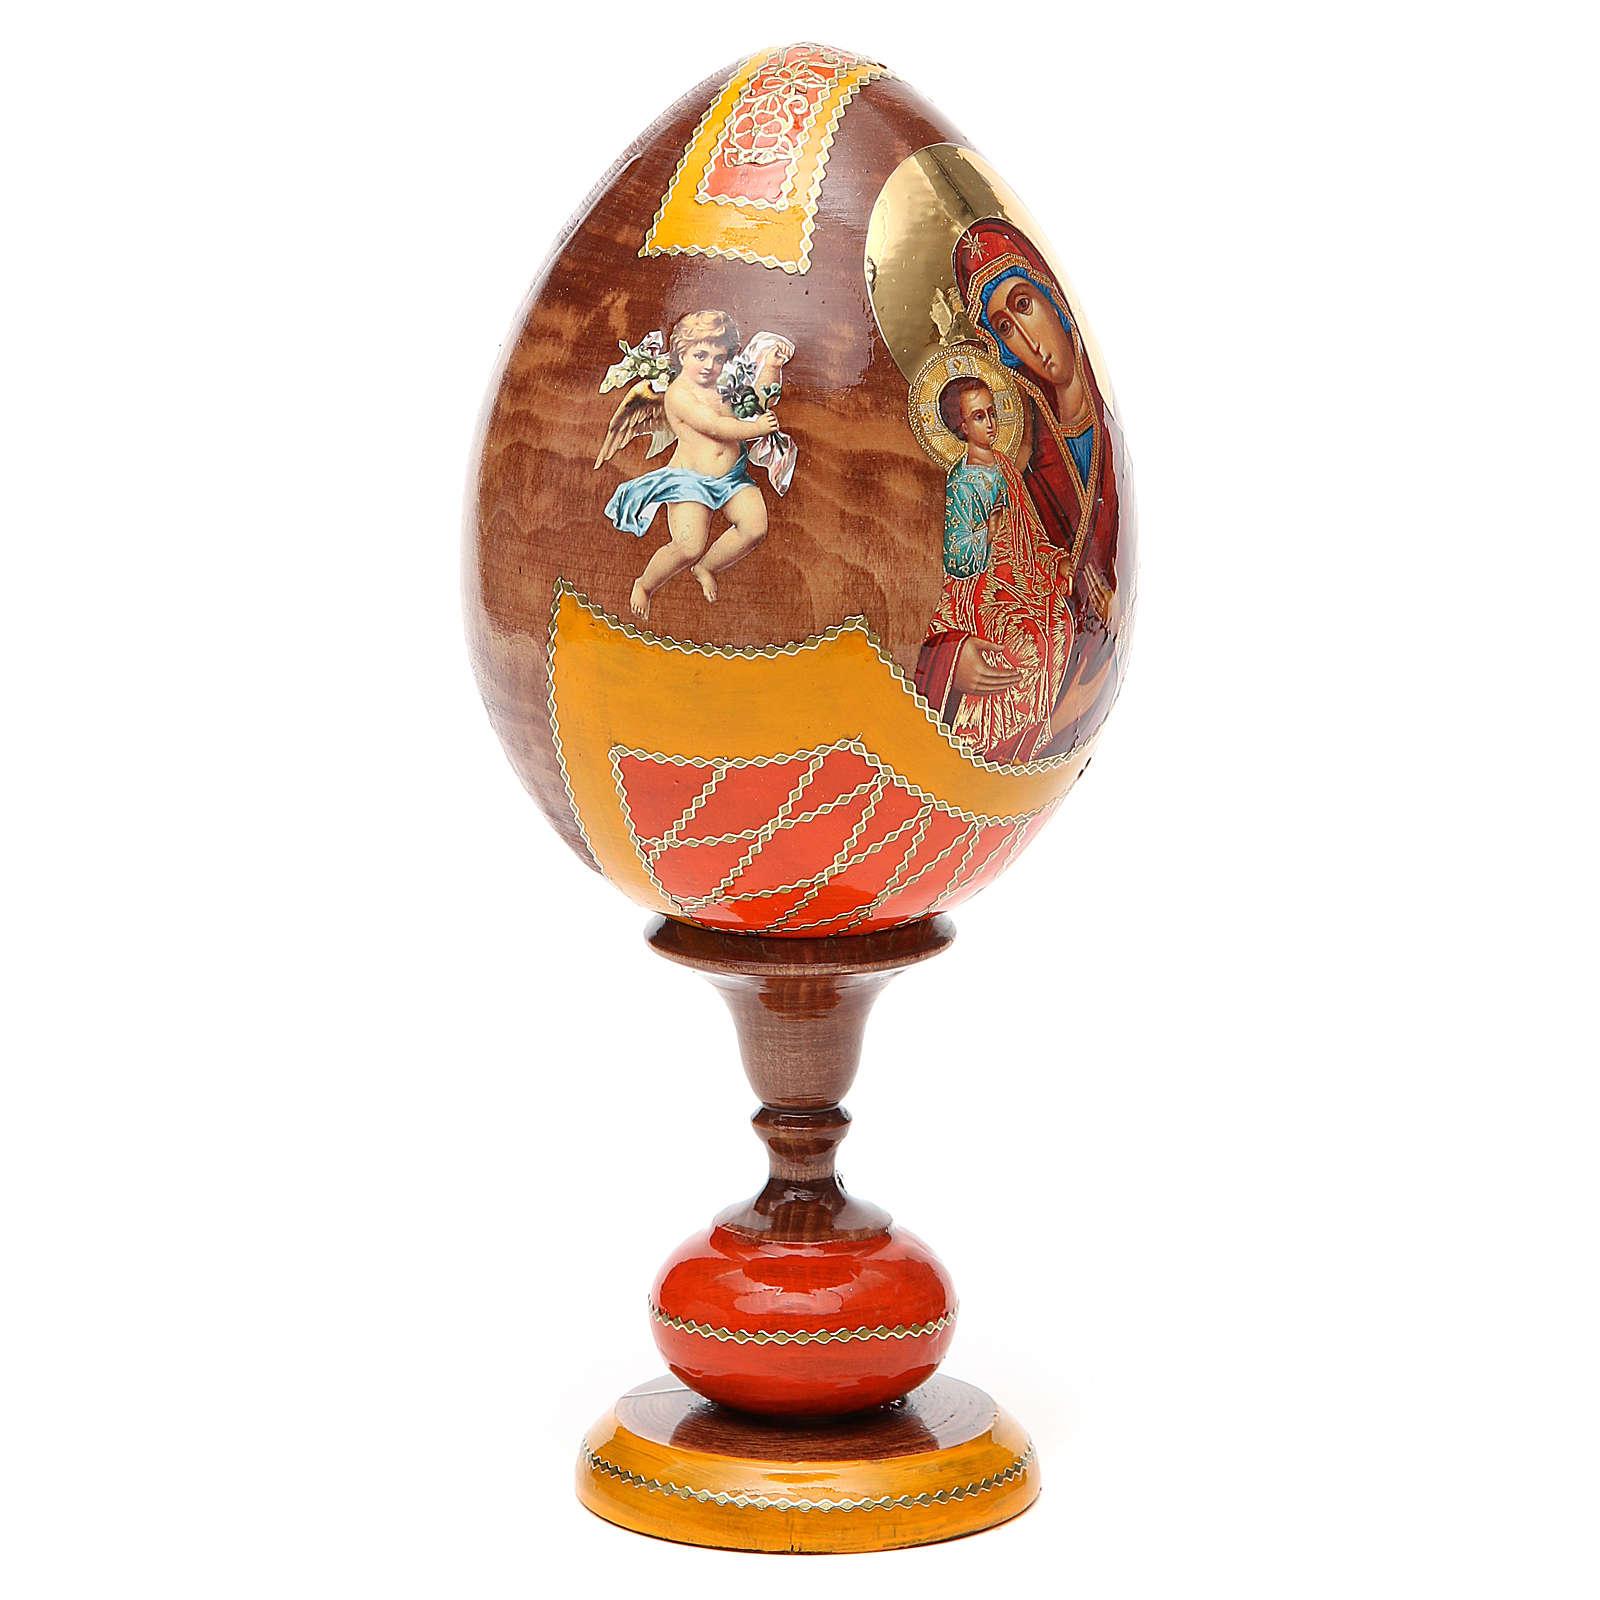 Uovo legno découpage Russia Tre Mani tot h 20 cm stile Fabergè 4